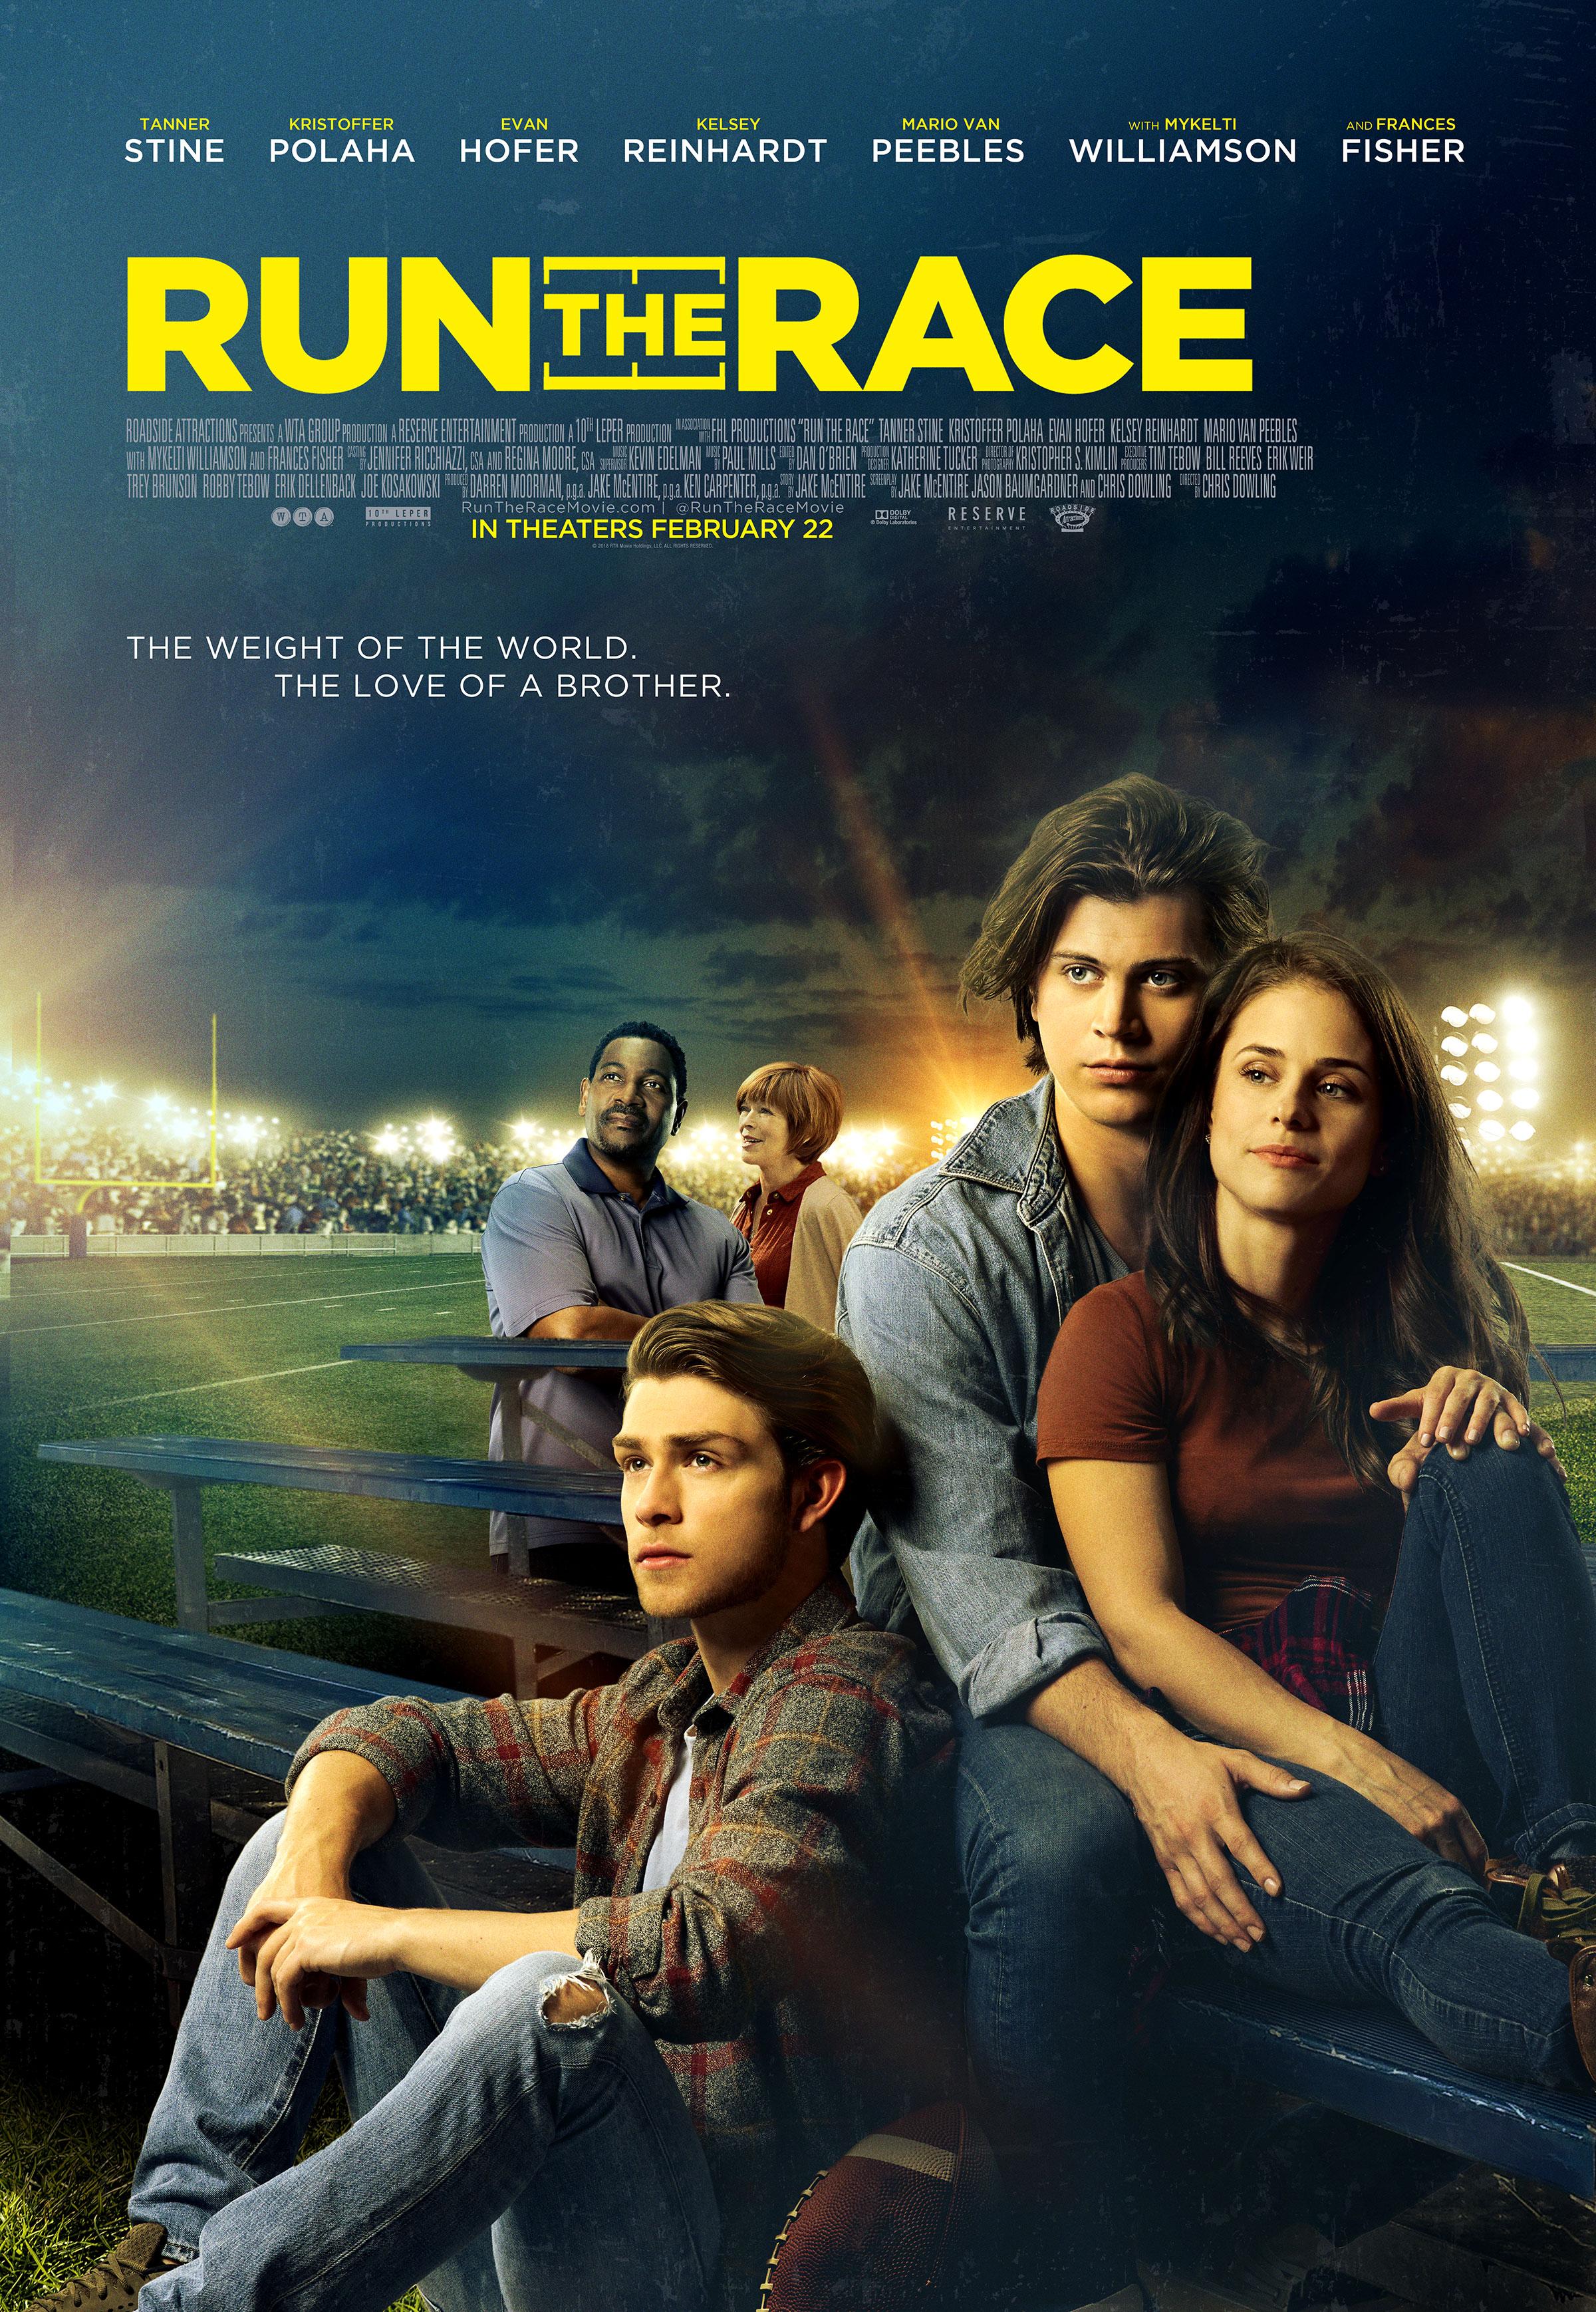 Movies Joplin Mo >> Run The Race At An Amc Theatre Near You